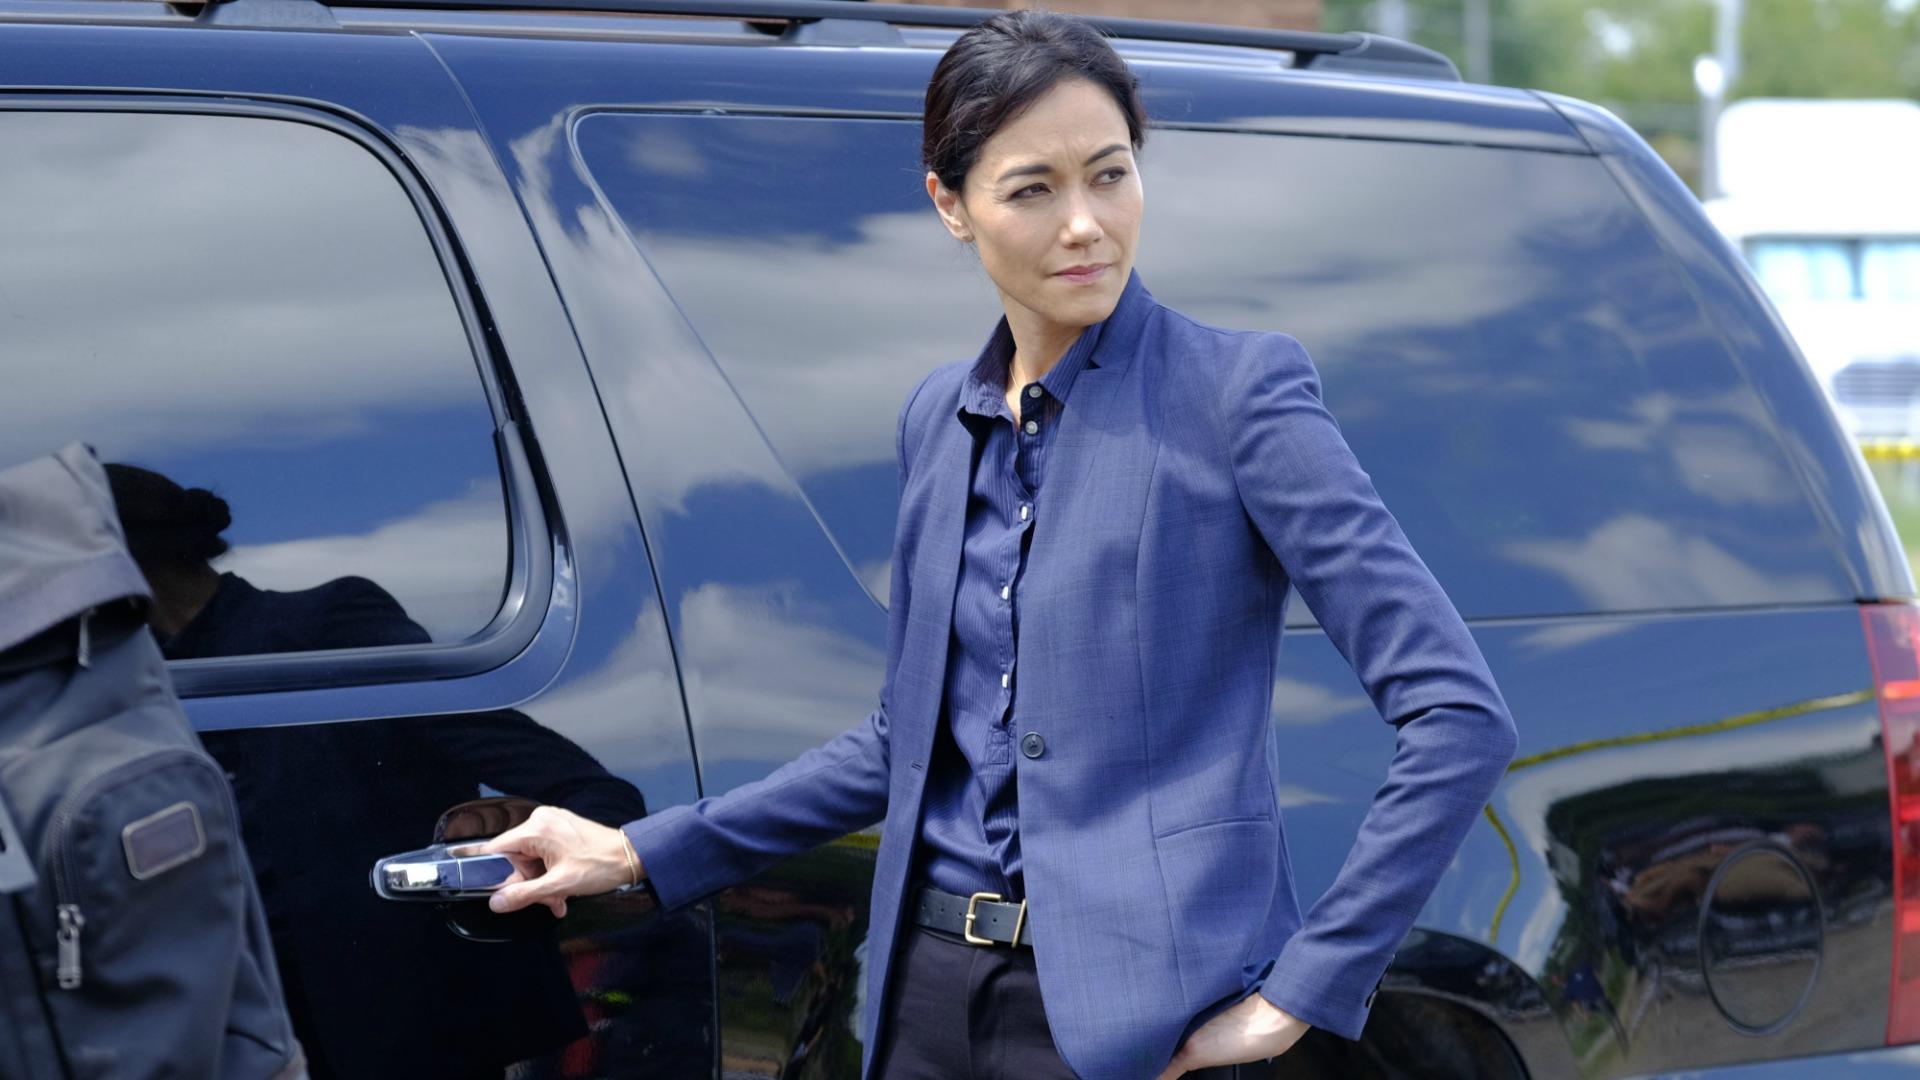 Patricia Thornton enters a vehicle.